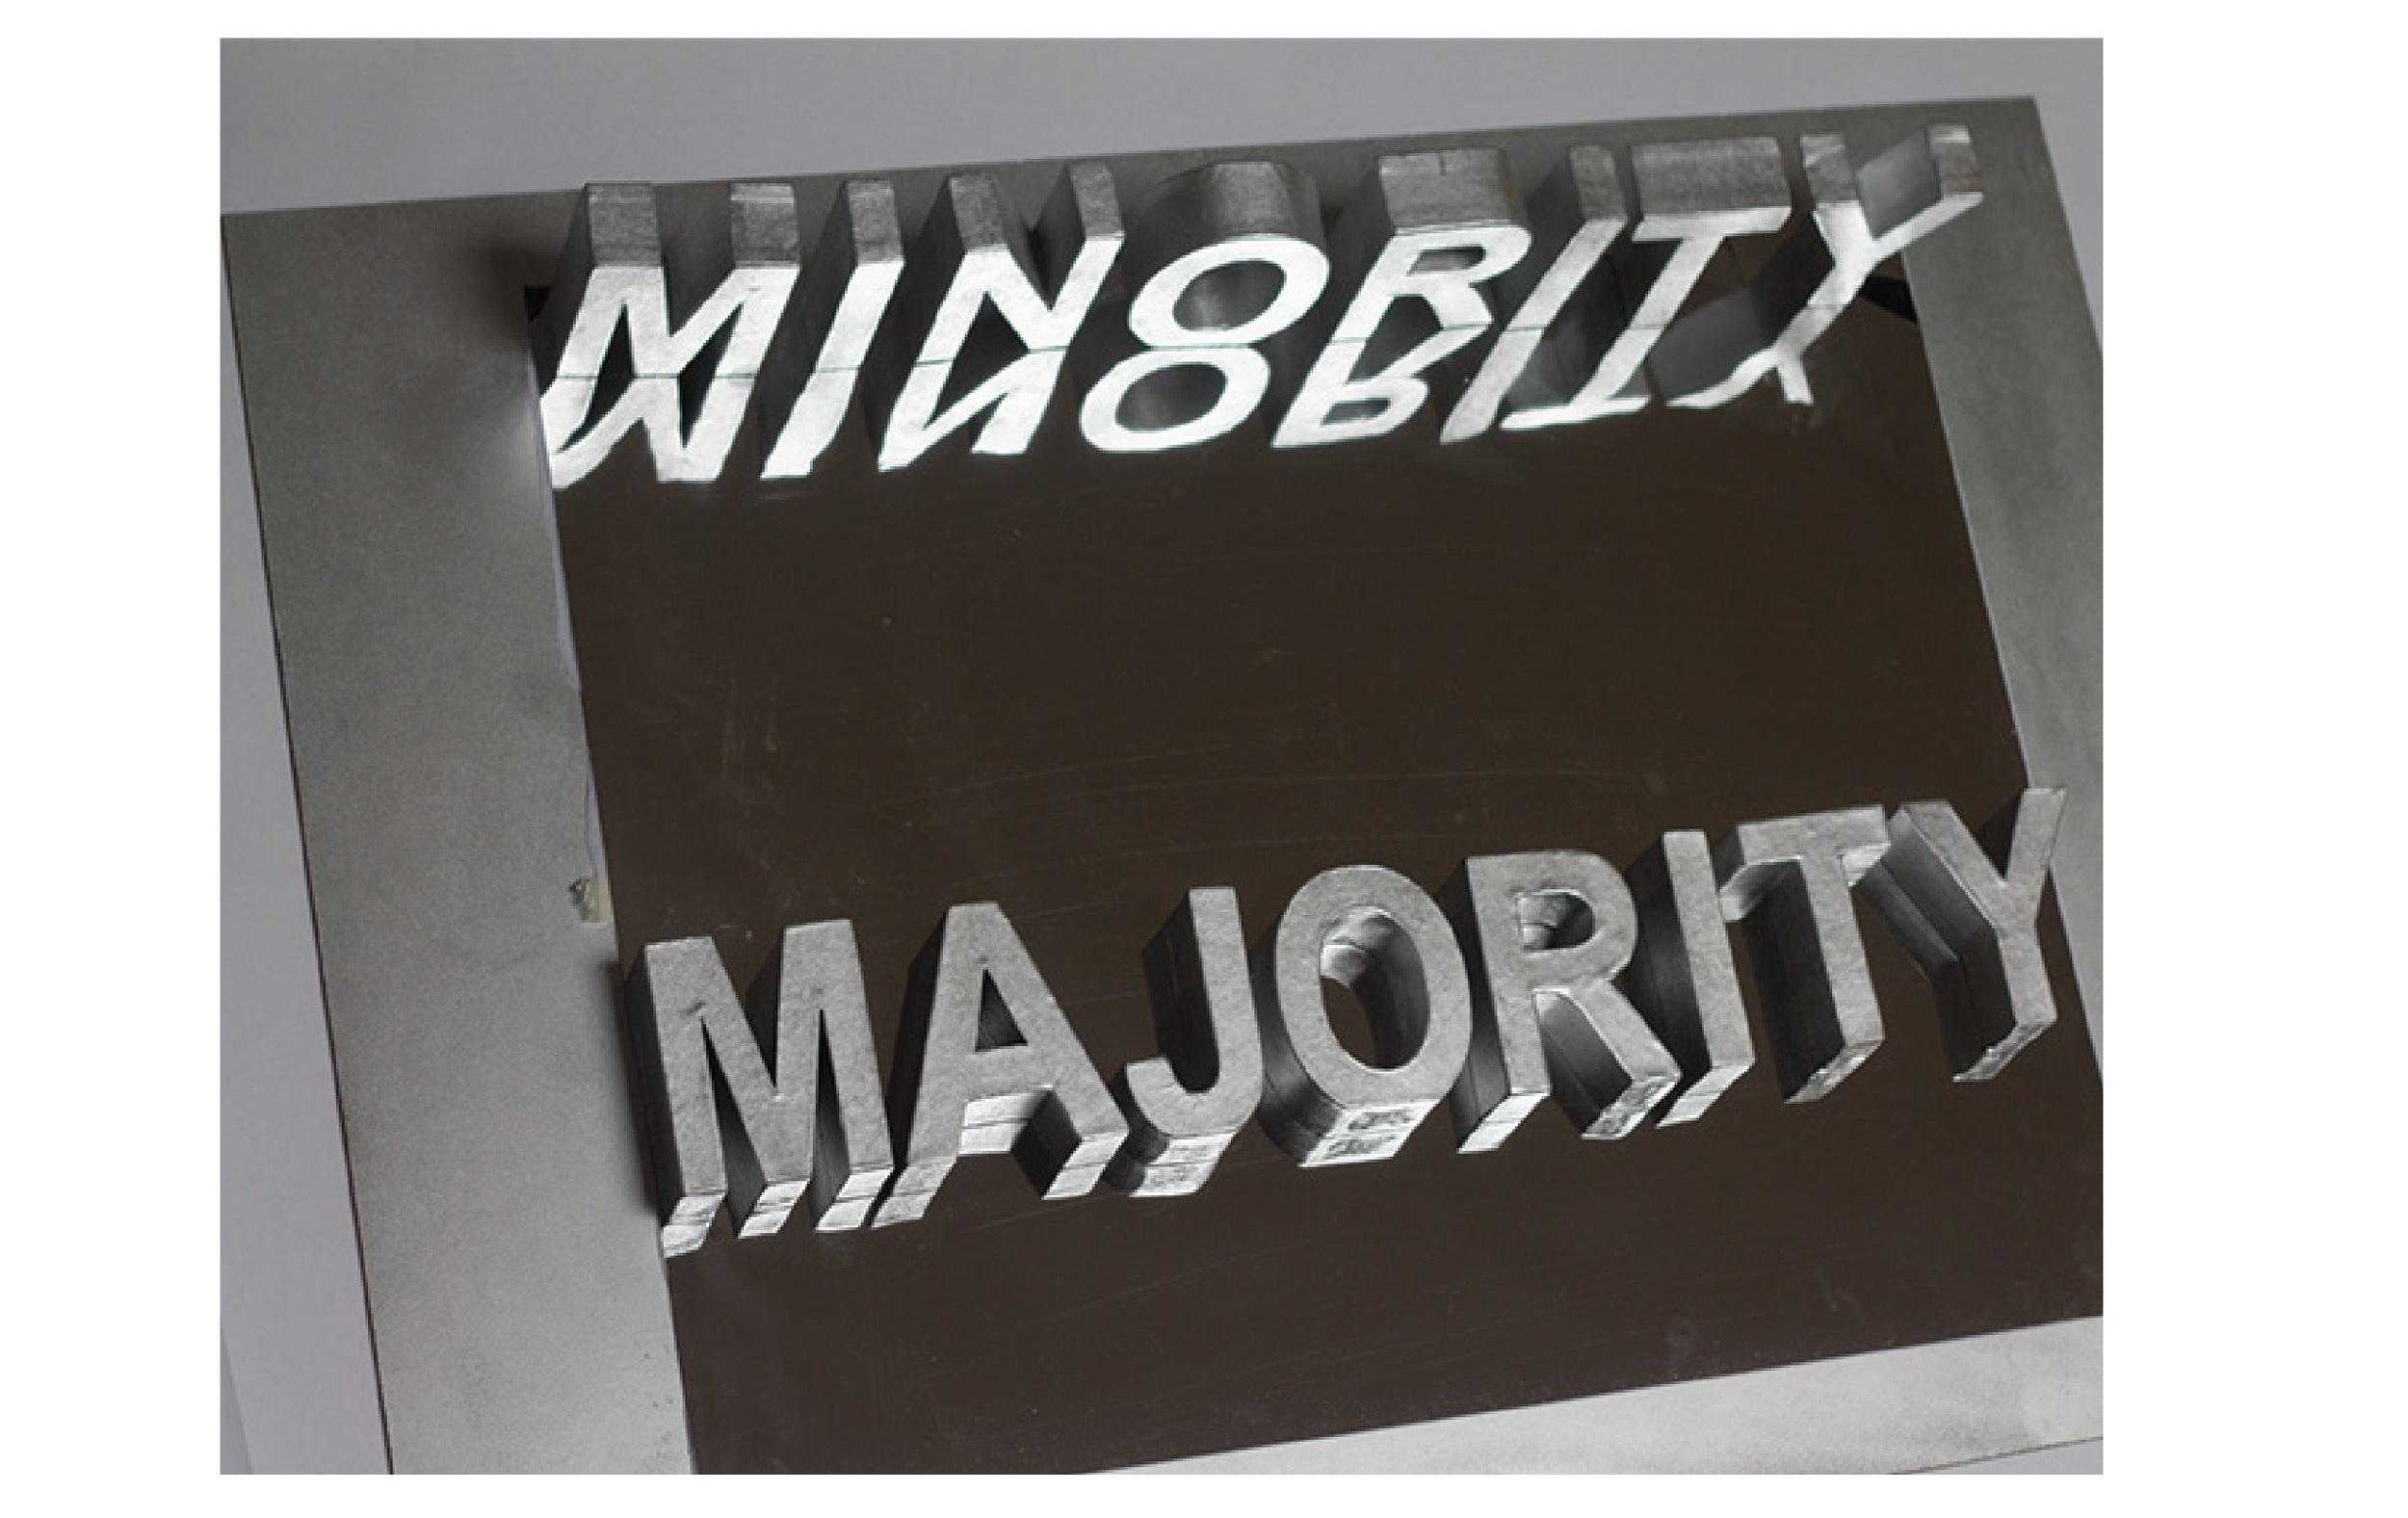 Reece_MinorityoverMajority.jpg